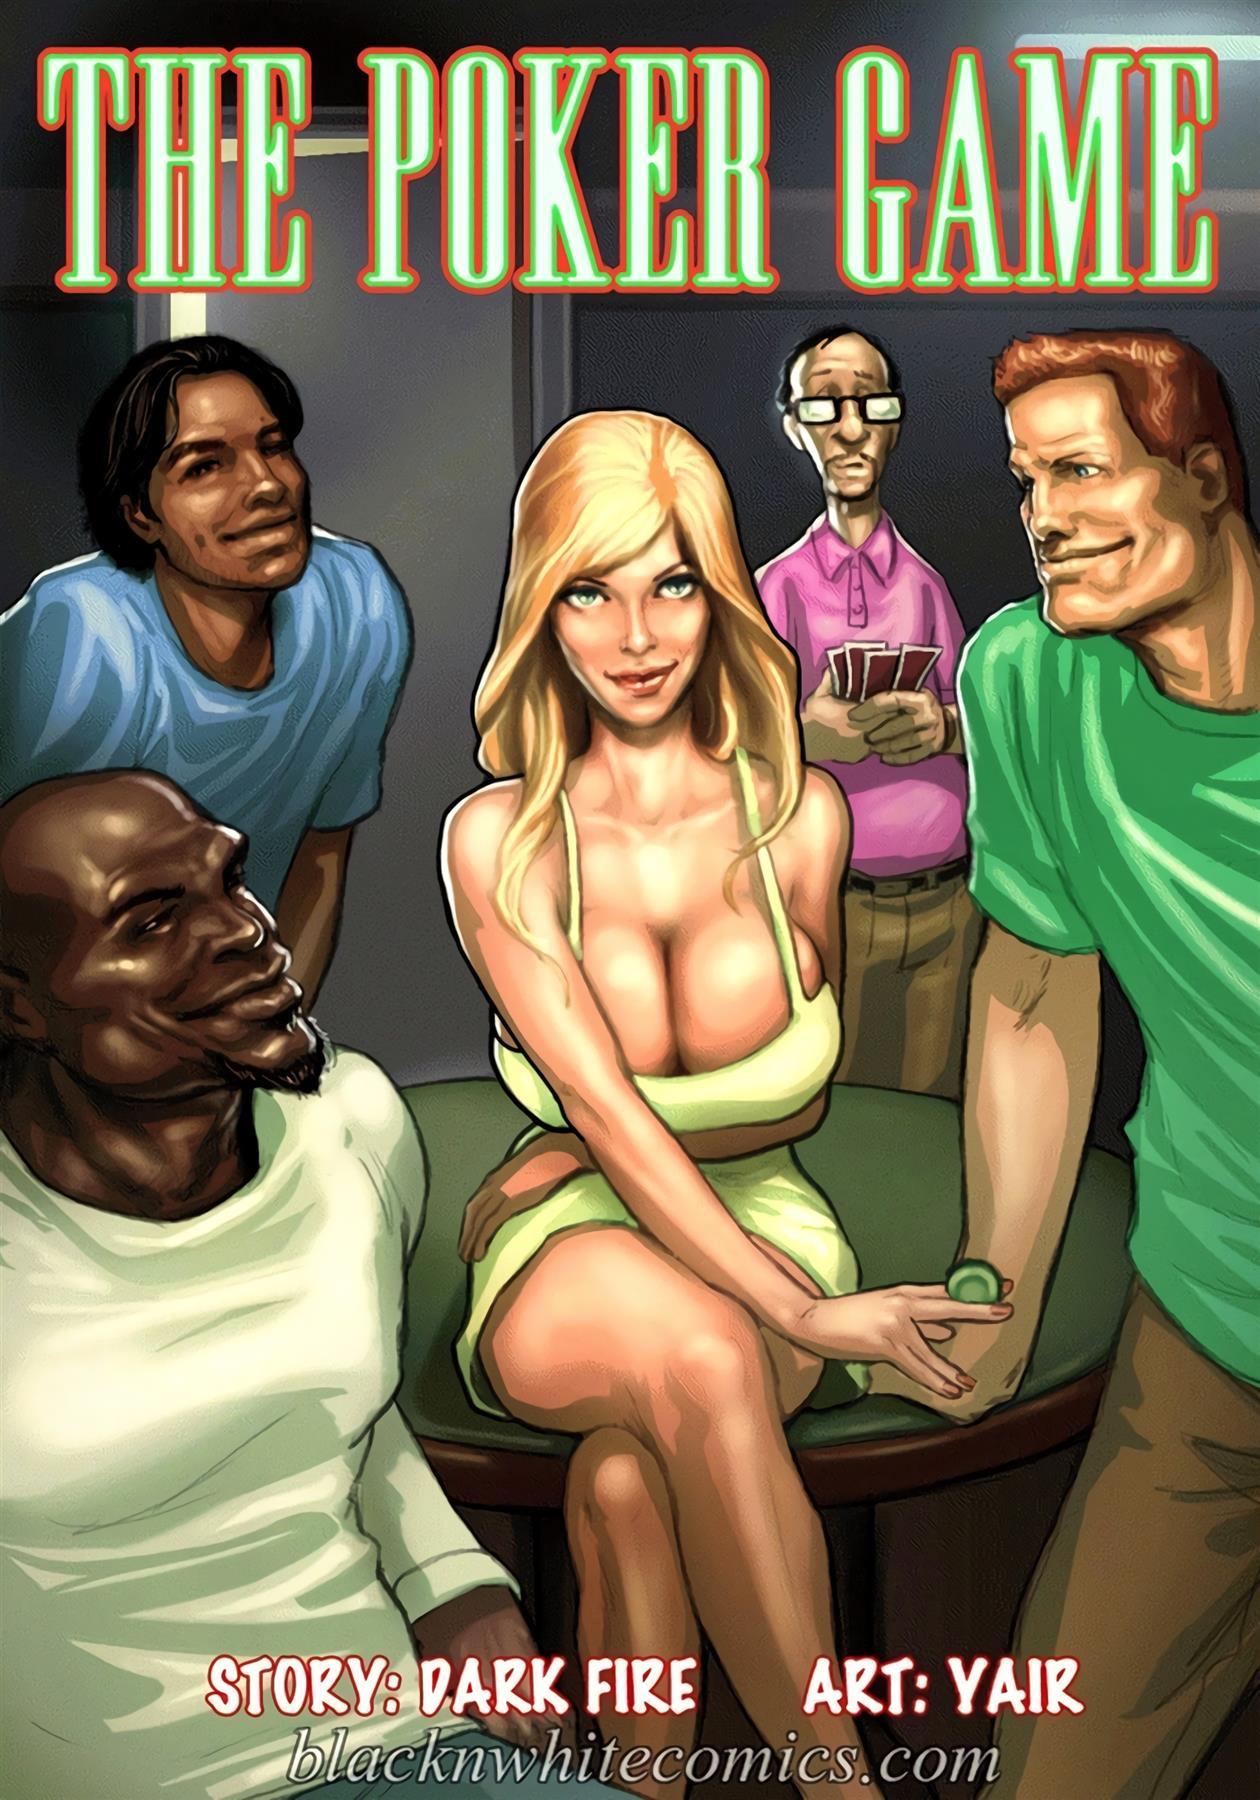 The Poker Game [BlackNwhite]